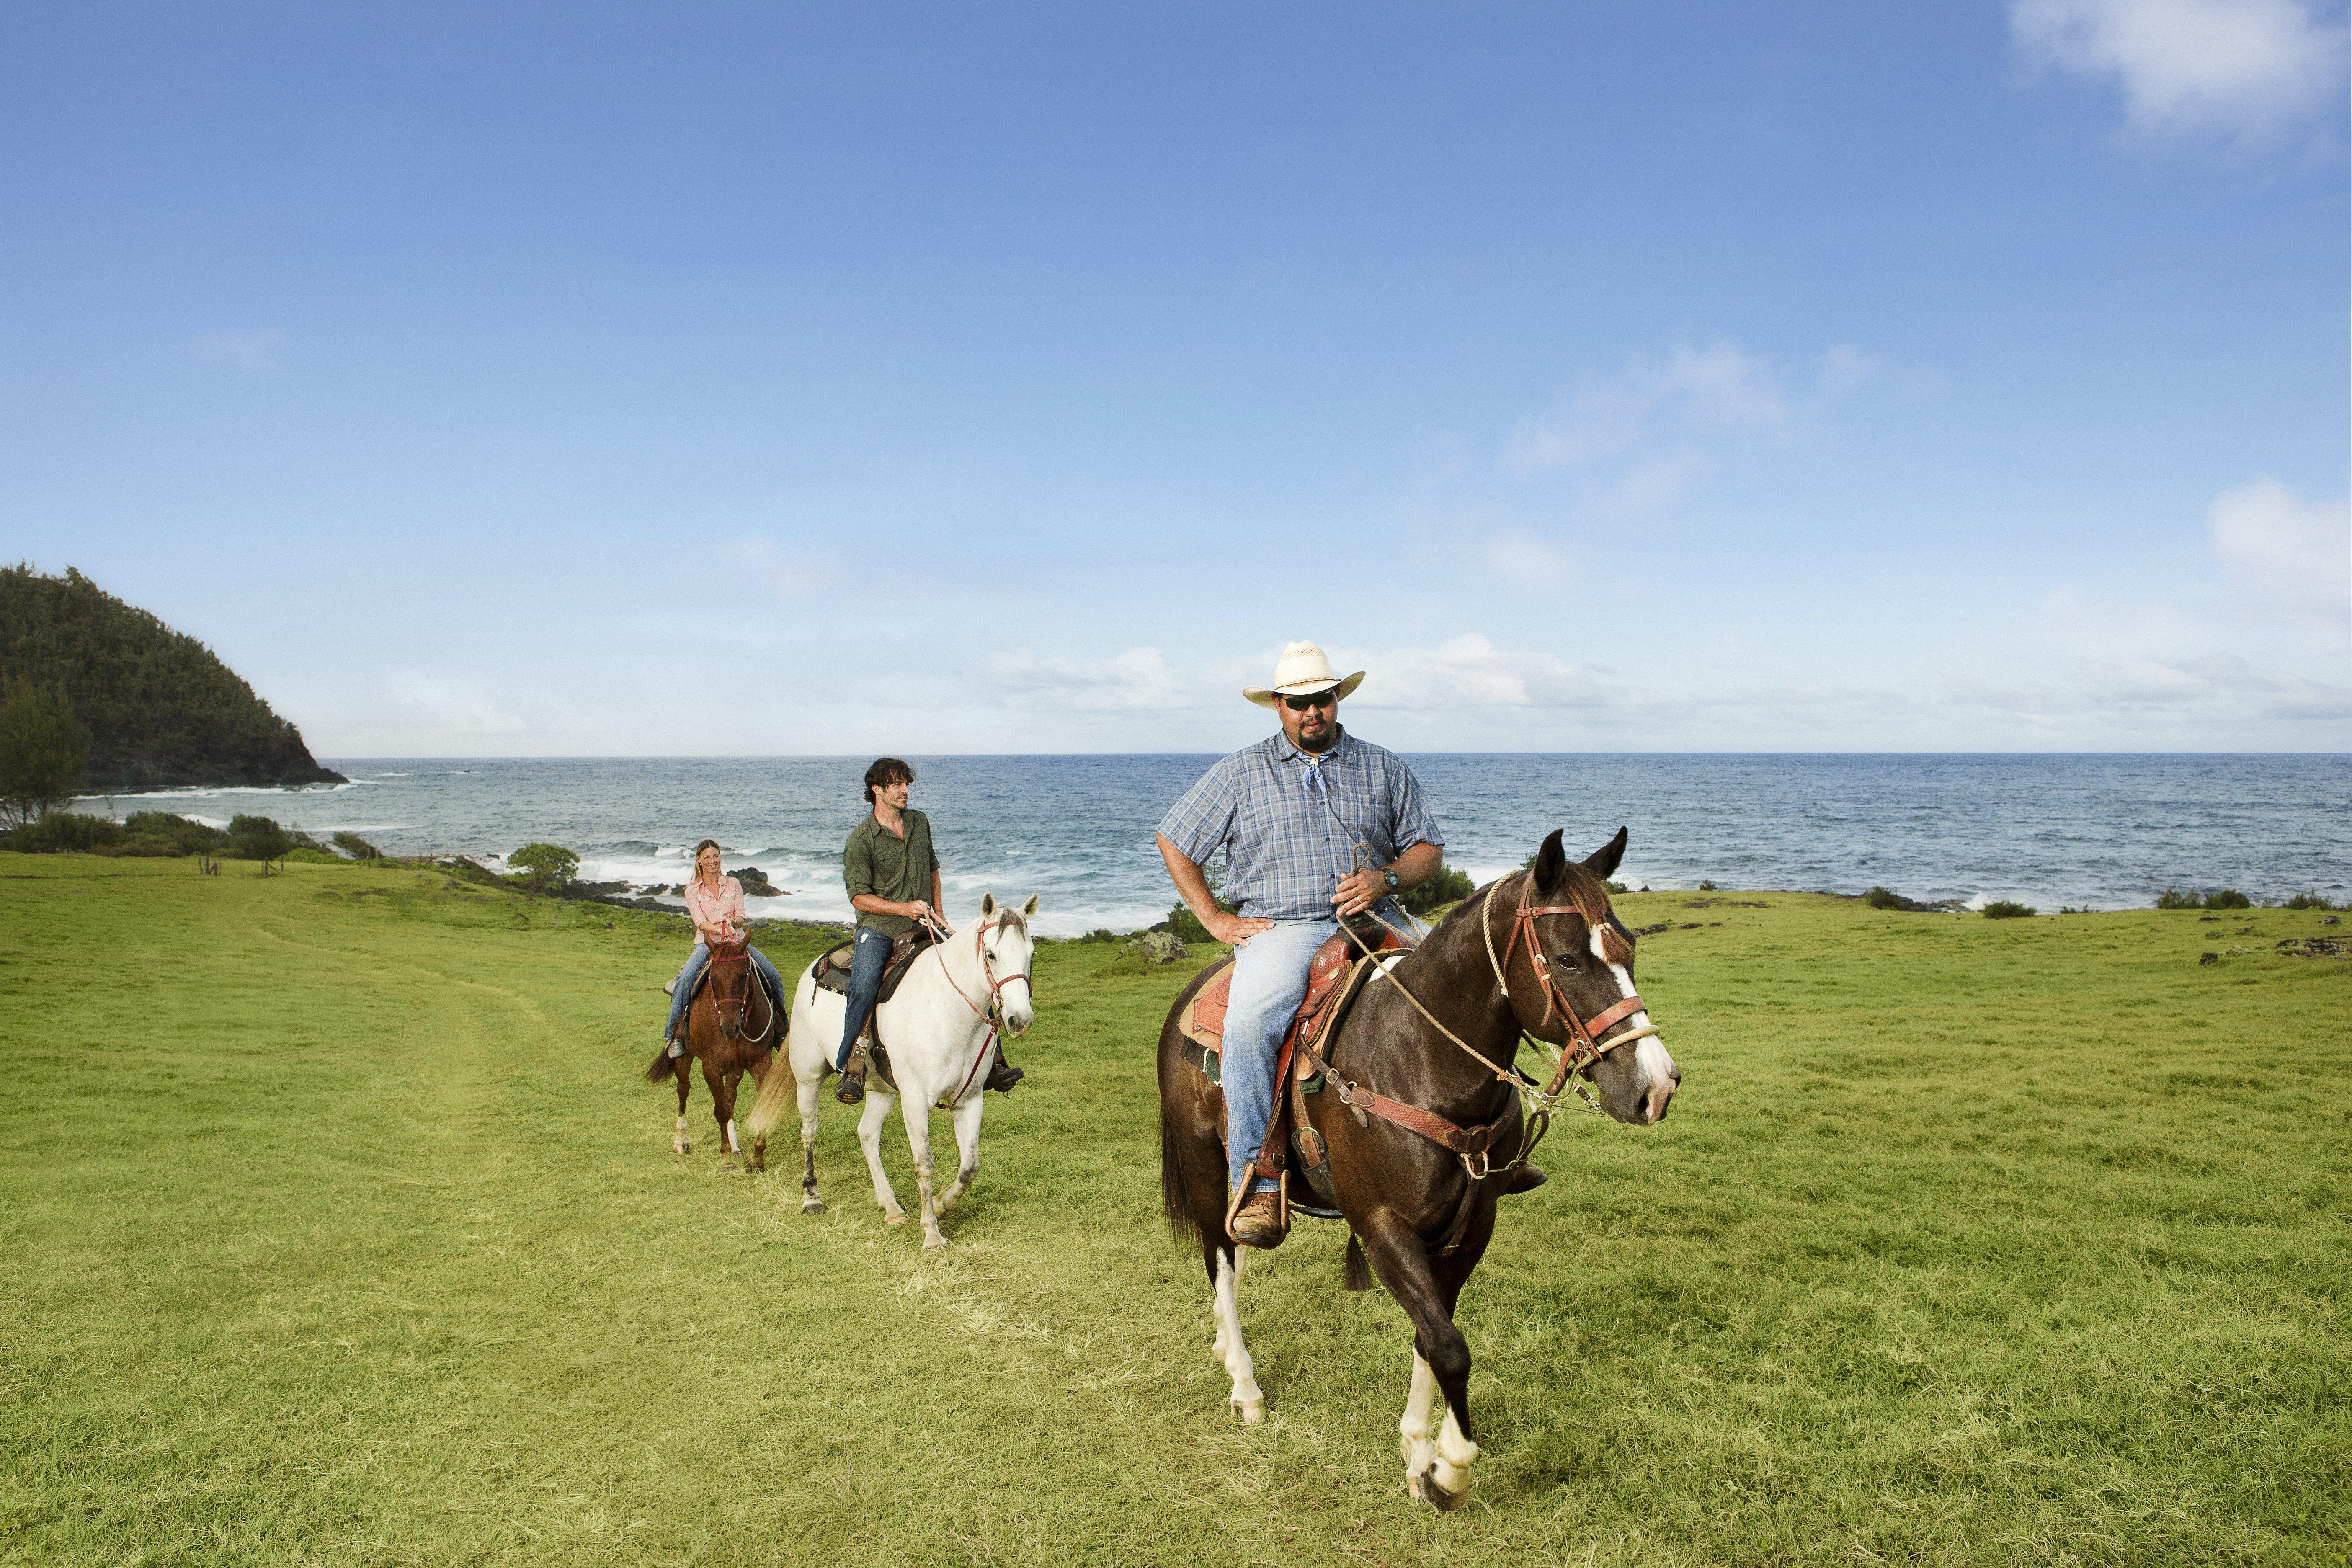 Experience horseback riding along the eastern coastline of Maui at Travaasa Hāna